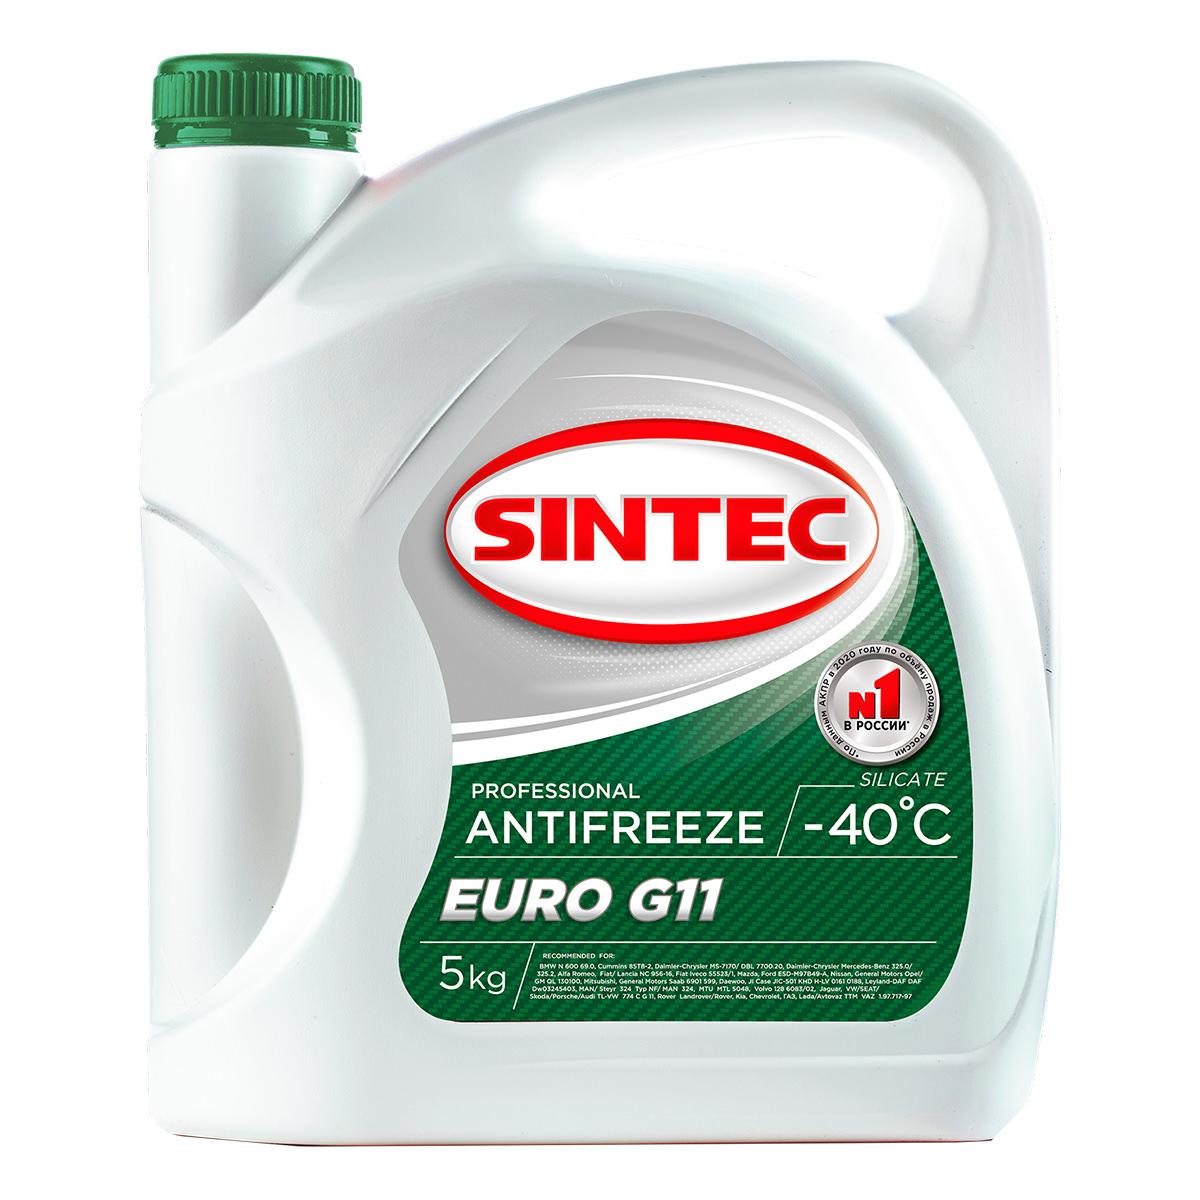 SINTEC ANTIFREEZE EURO G11 (-40)